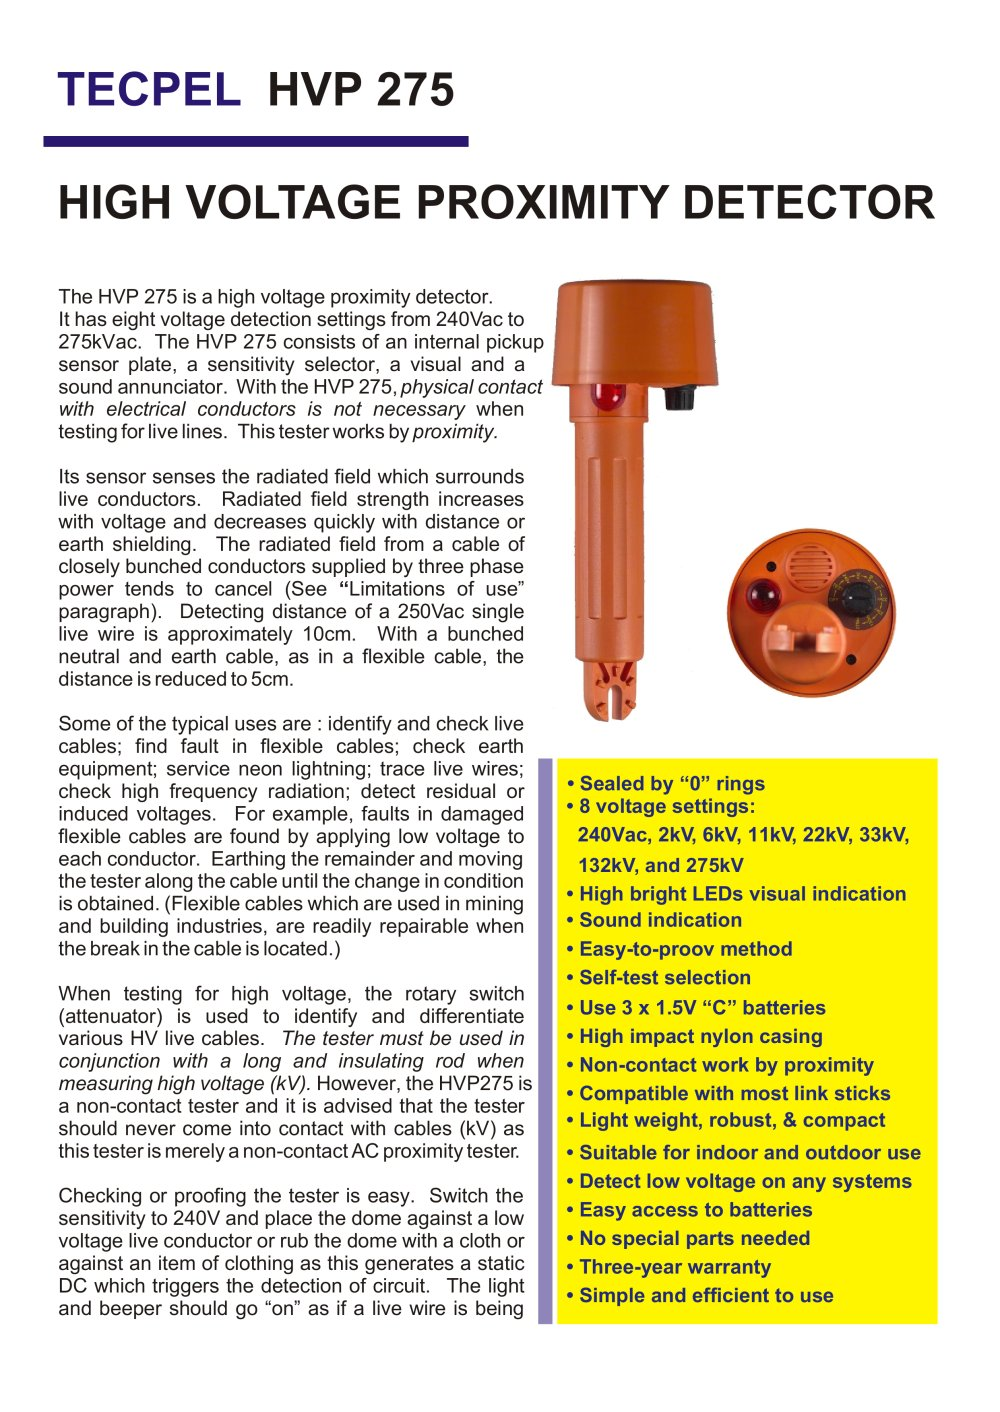 TECPEL High Voltage Proximity Detector HVP-275 - Tecpel Co., Ltd ...